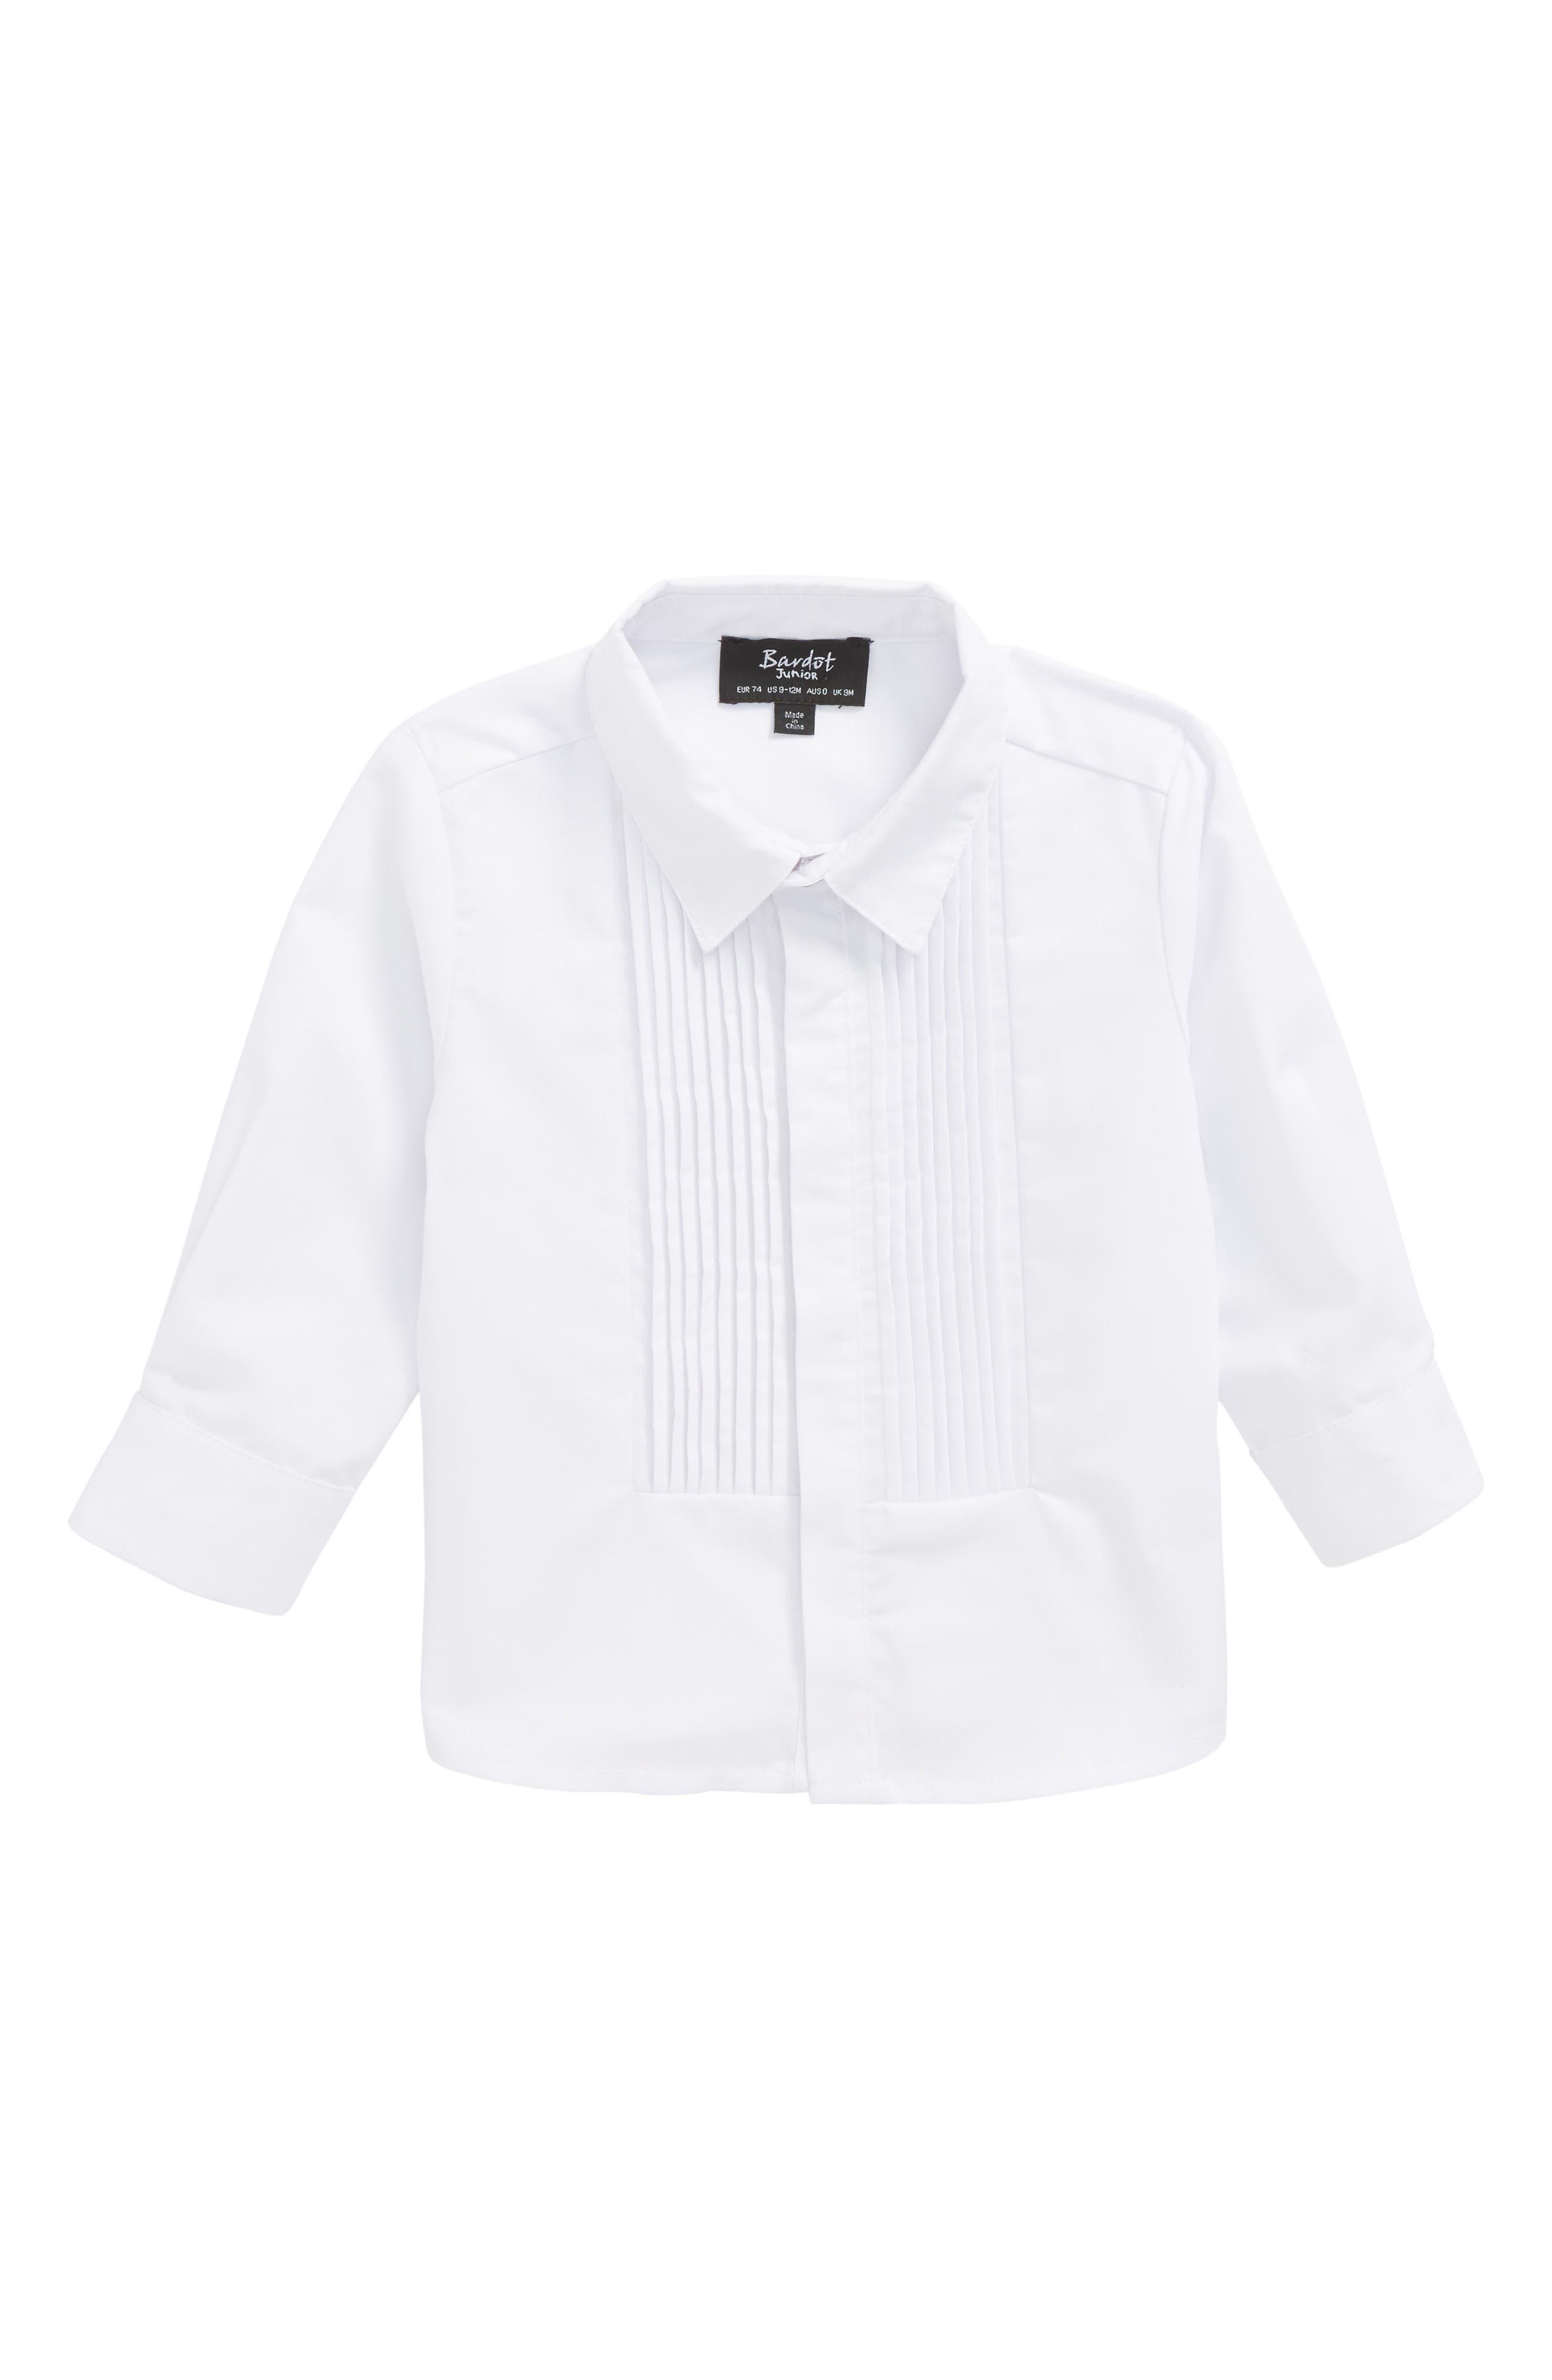 Tuxedo Shirt,                         Main,                         color,